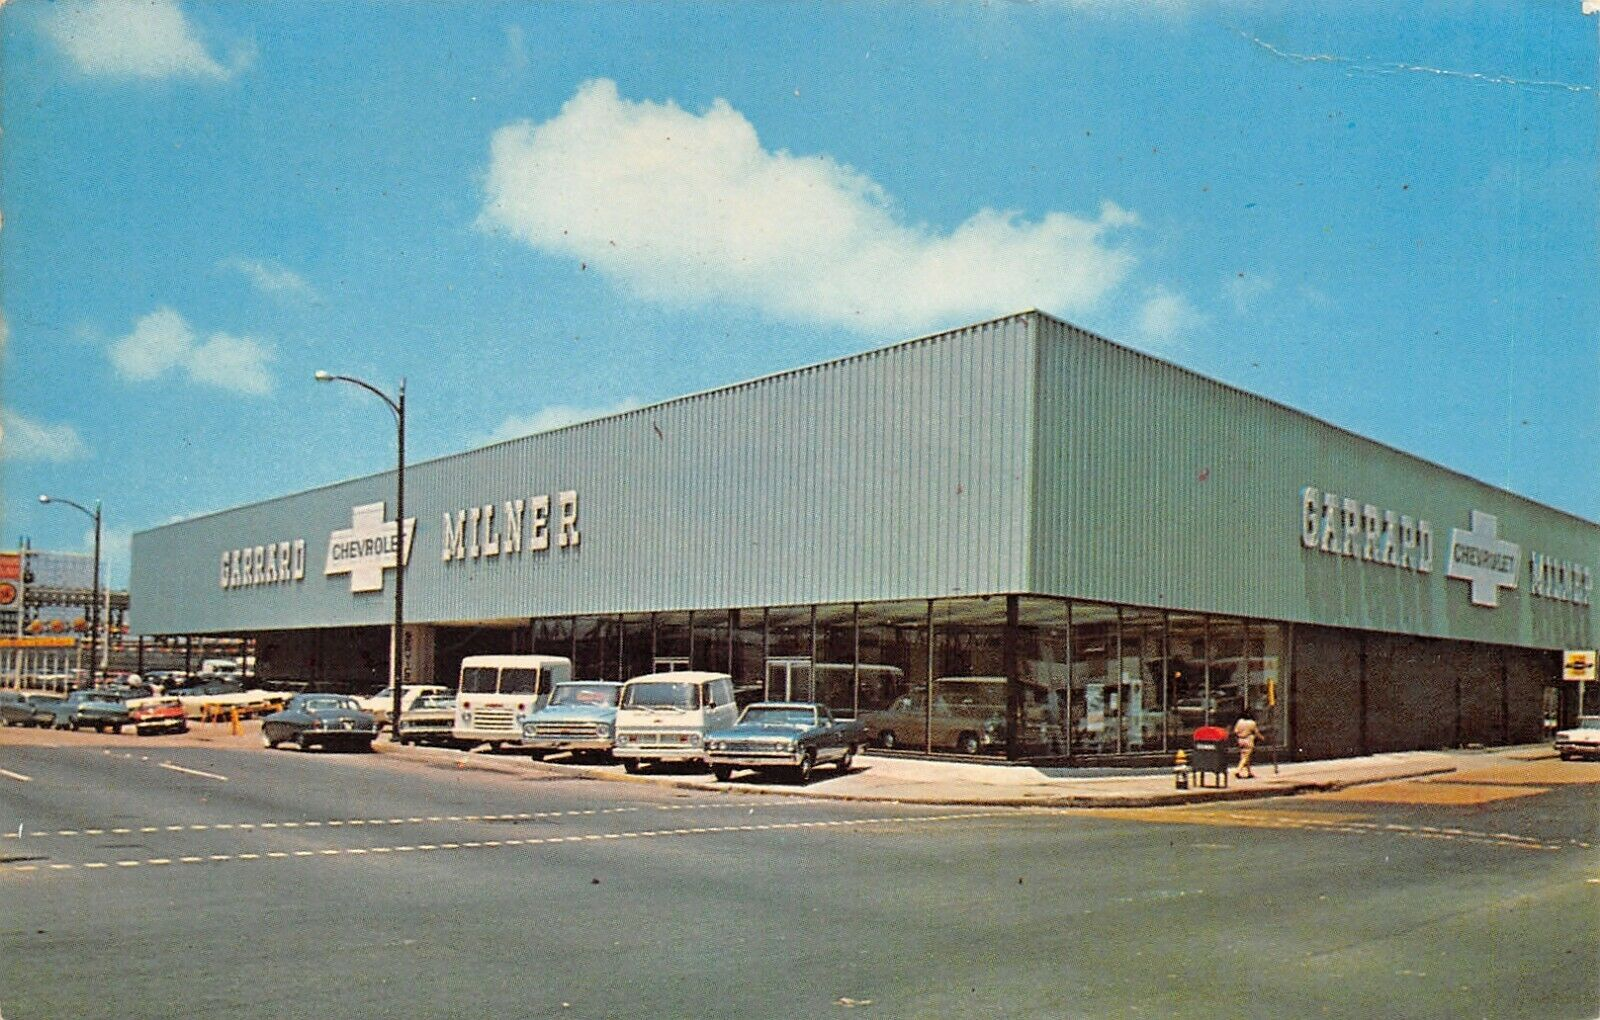 1967 Garrard Milner Chevrolet Dealership, New Orleans